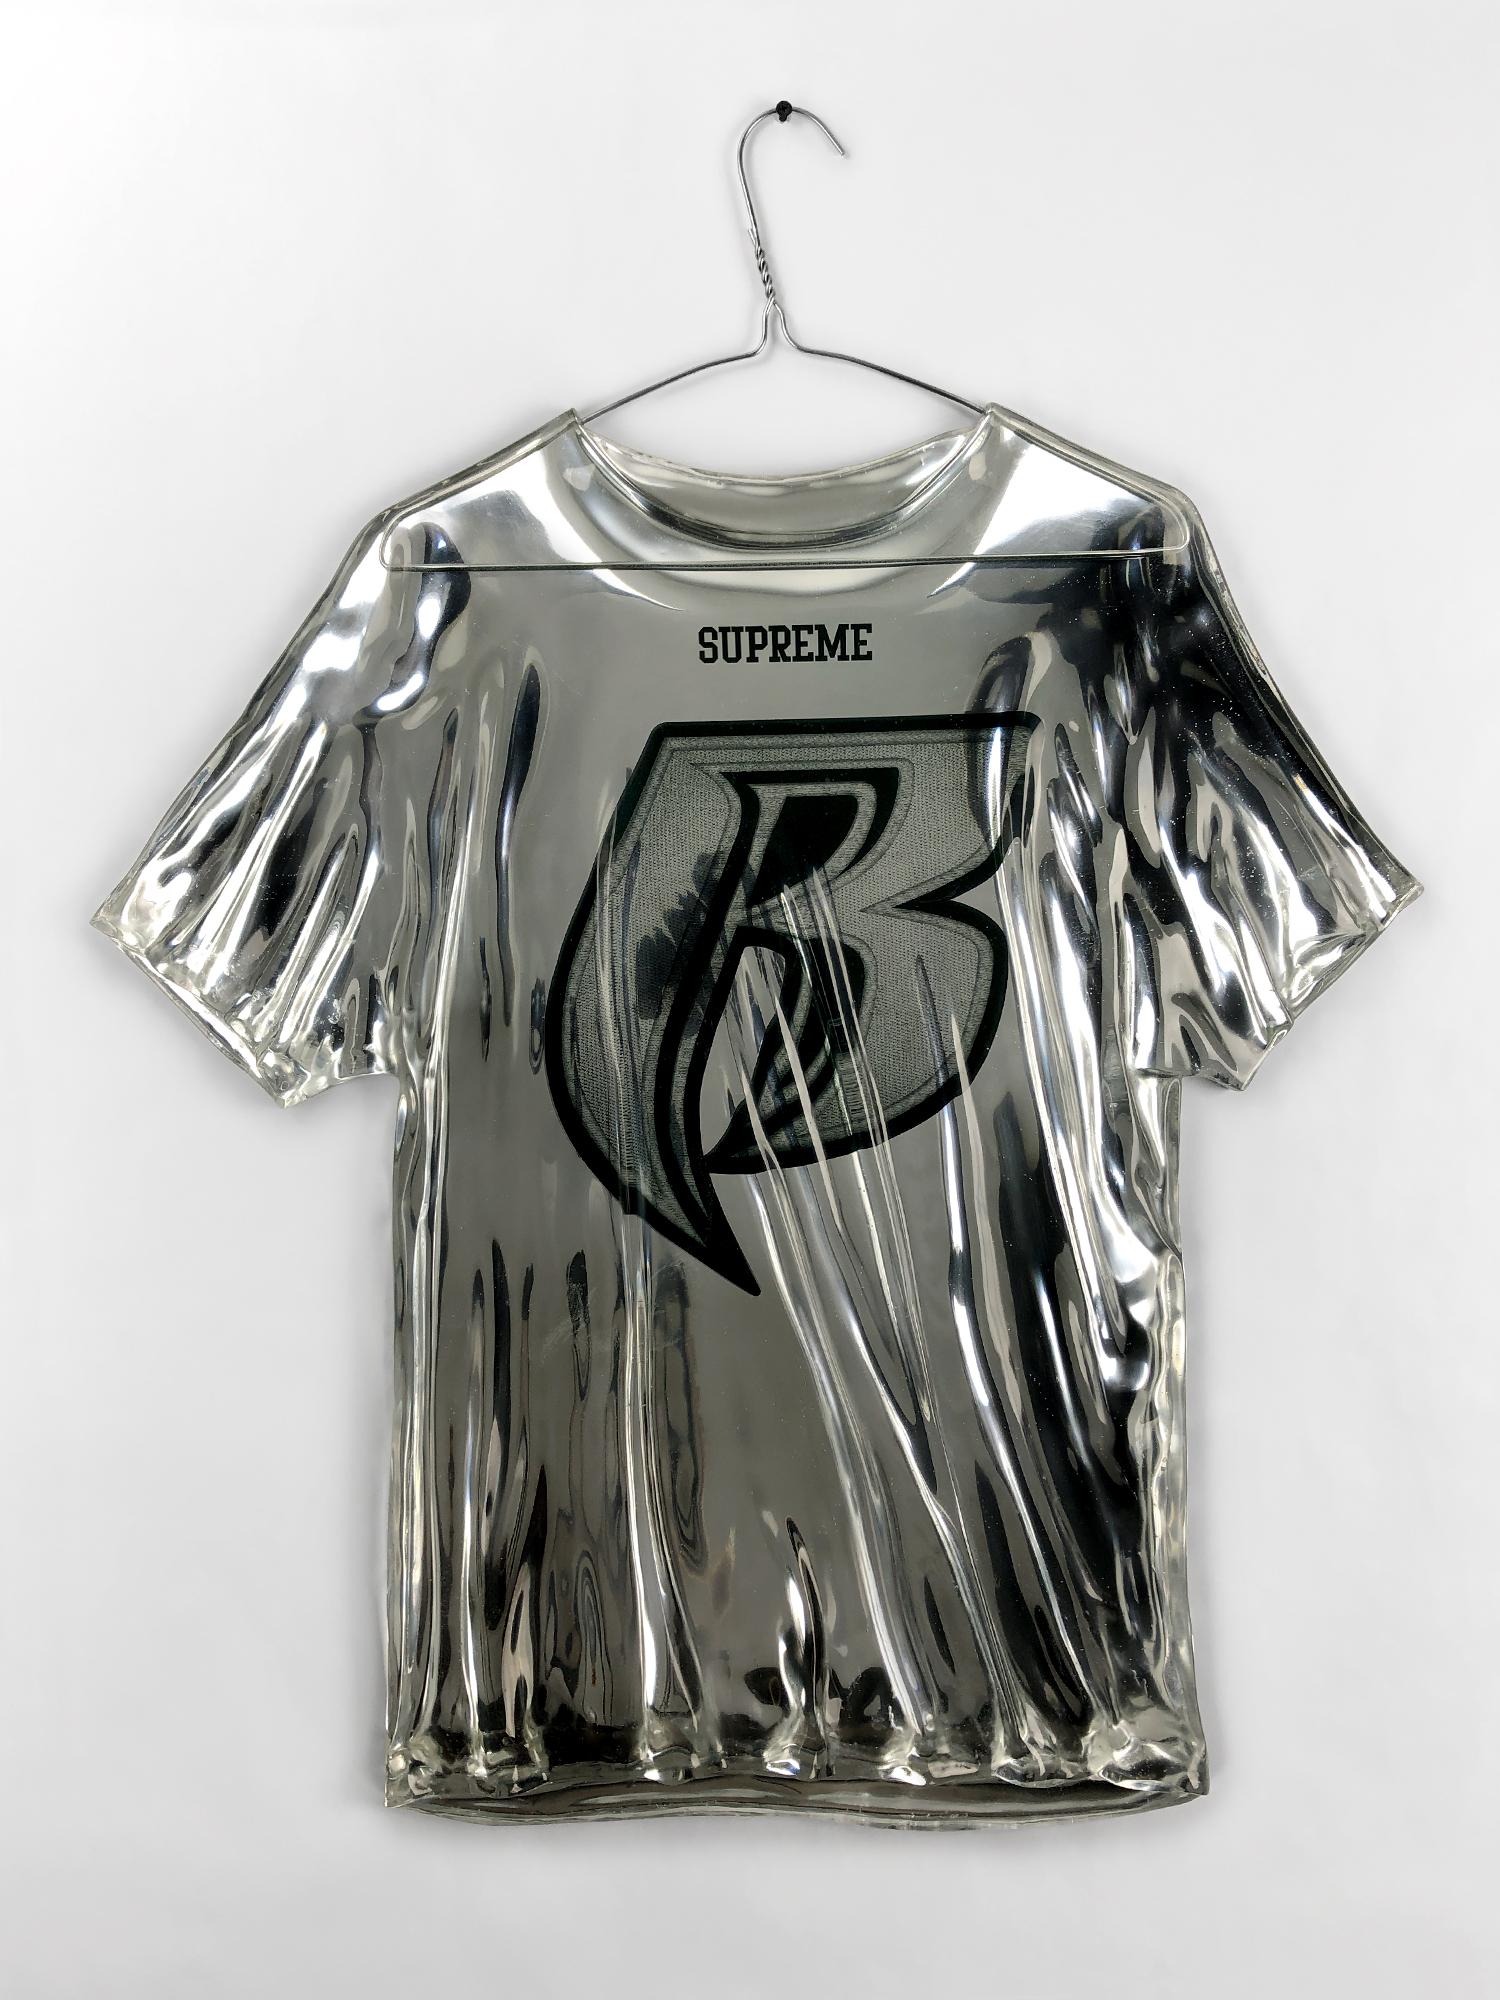 """Retired Jersey (Ruff Ryders Supreme)"""